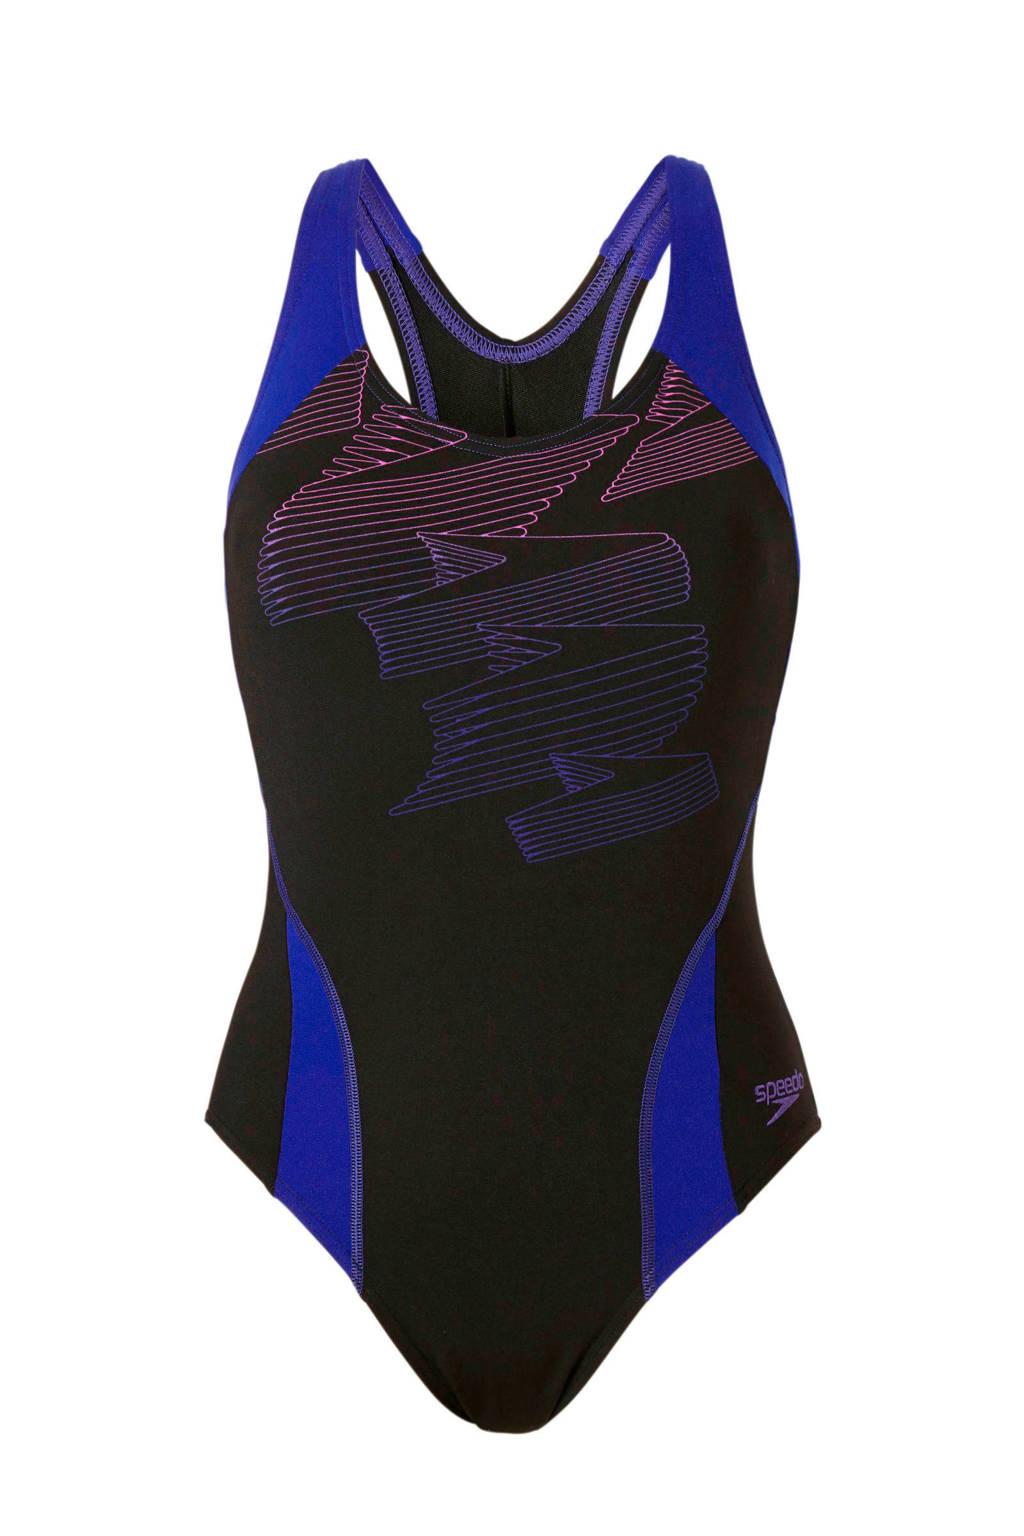 Speedo Endurance+ sportbadpak Boom Splice zwart/blauw, Zwart/blauw